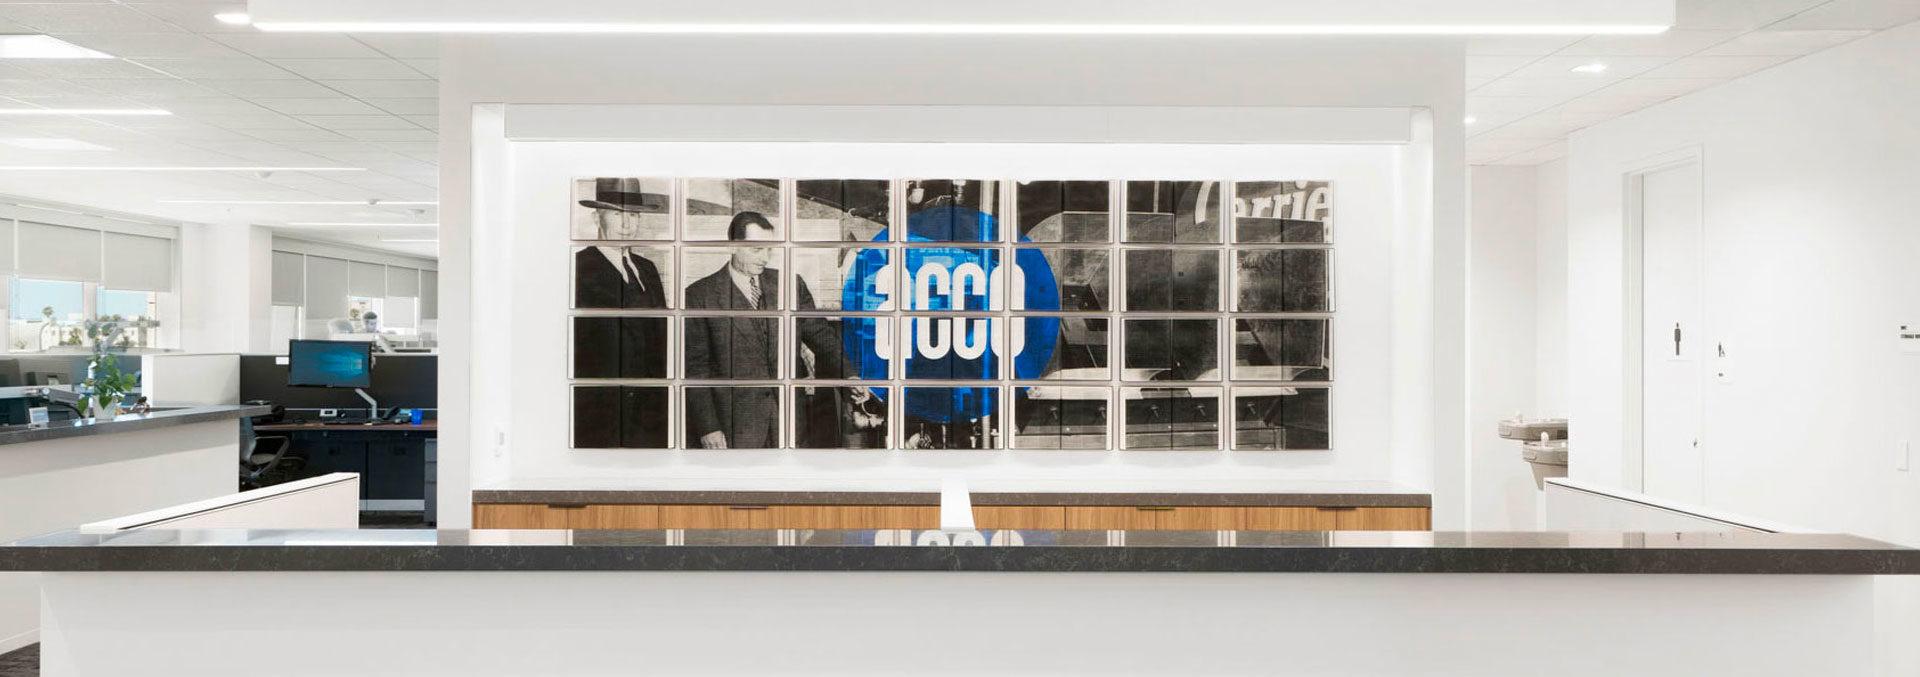 ACCO Corporate Headquarters